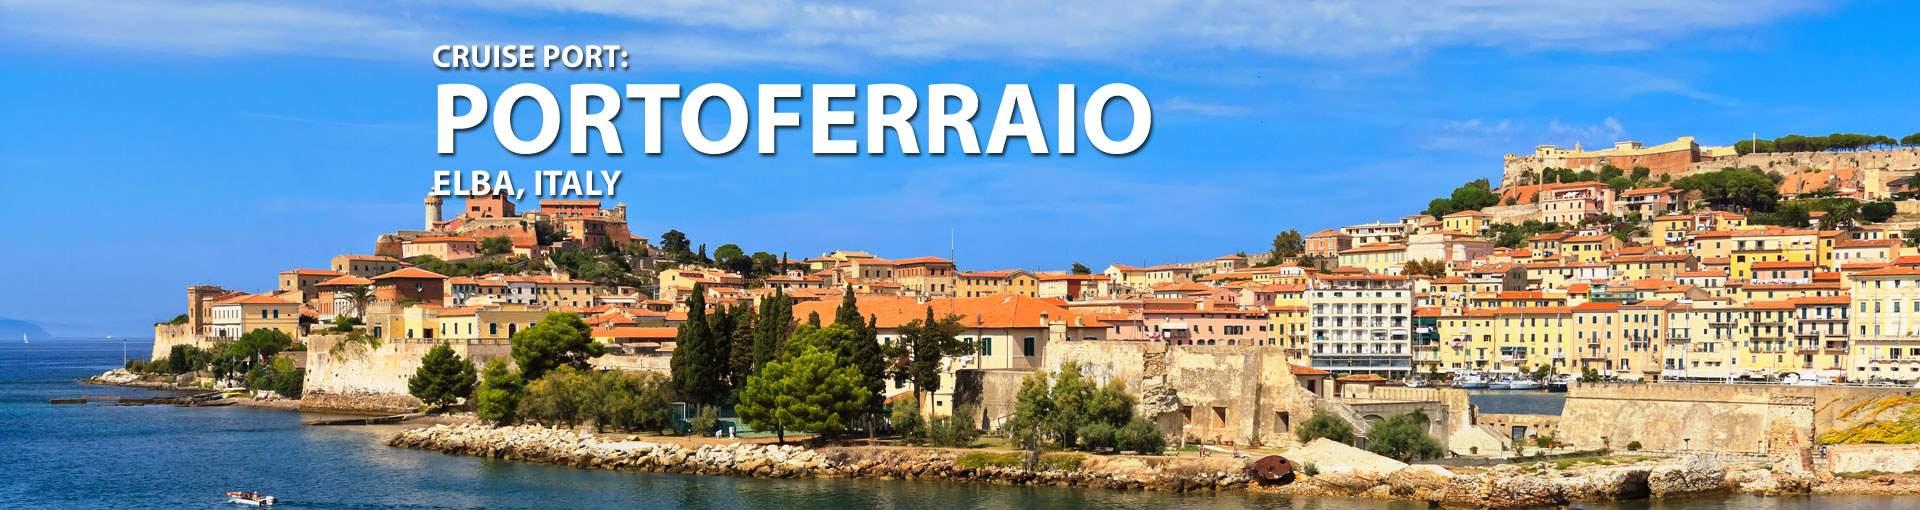 Cruises to Portoferraio (Elba), Italy